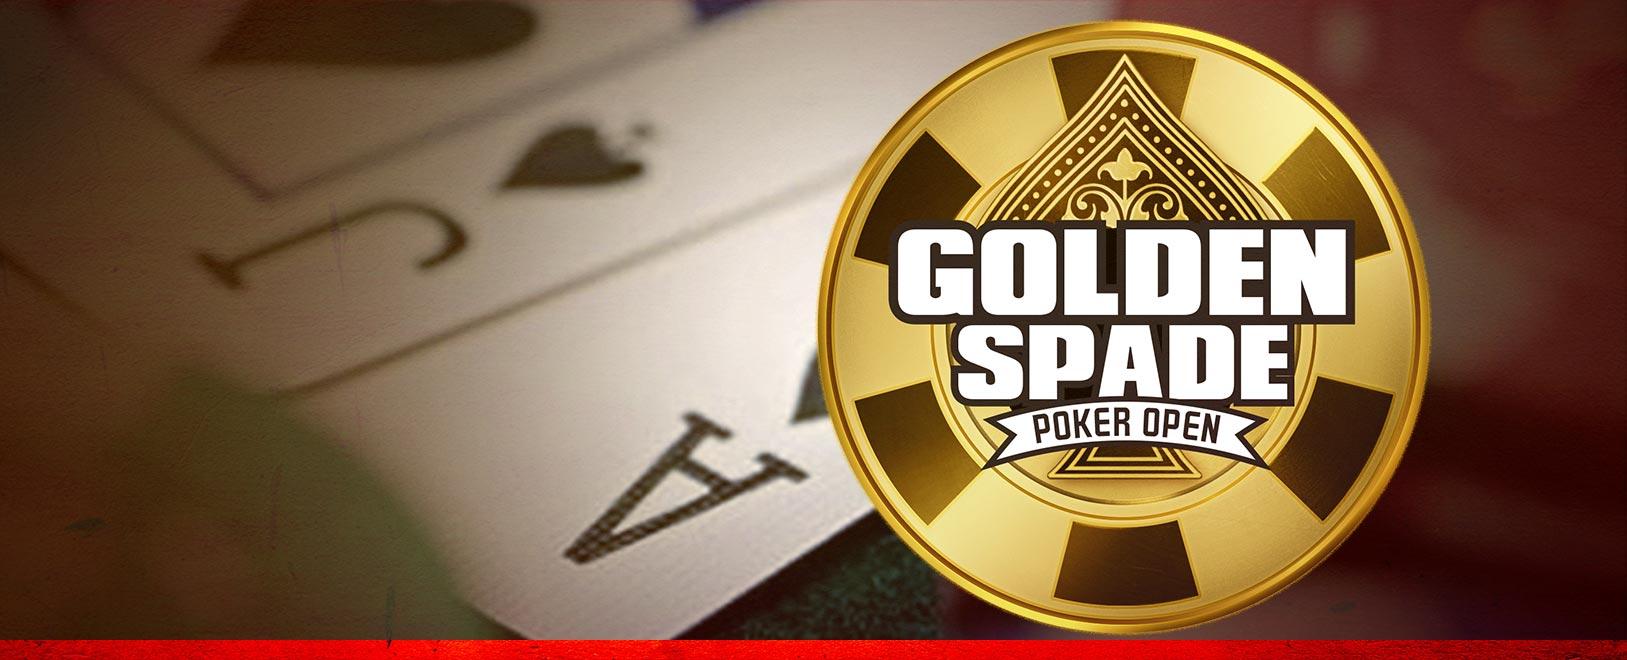 Use Bitcoin Bonuses to Dominate Poker Tournaments